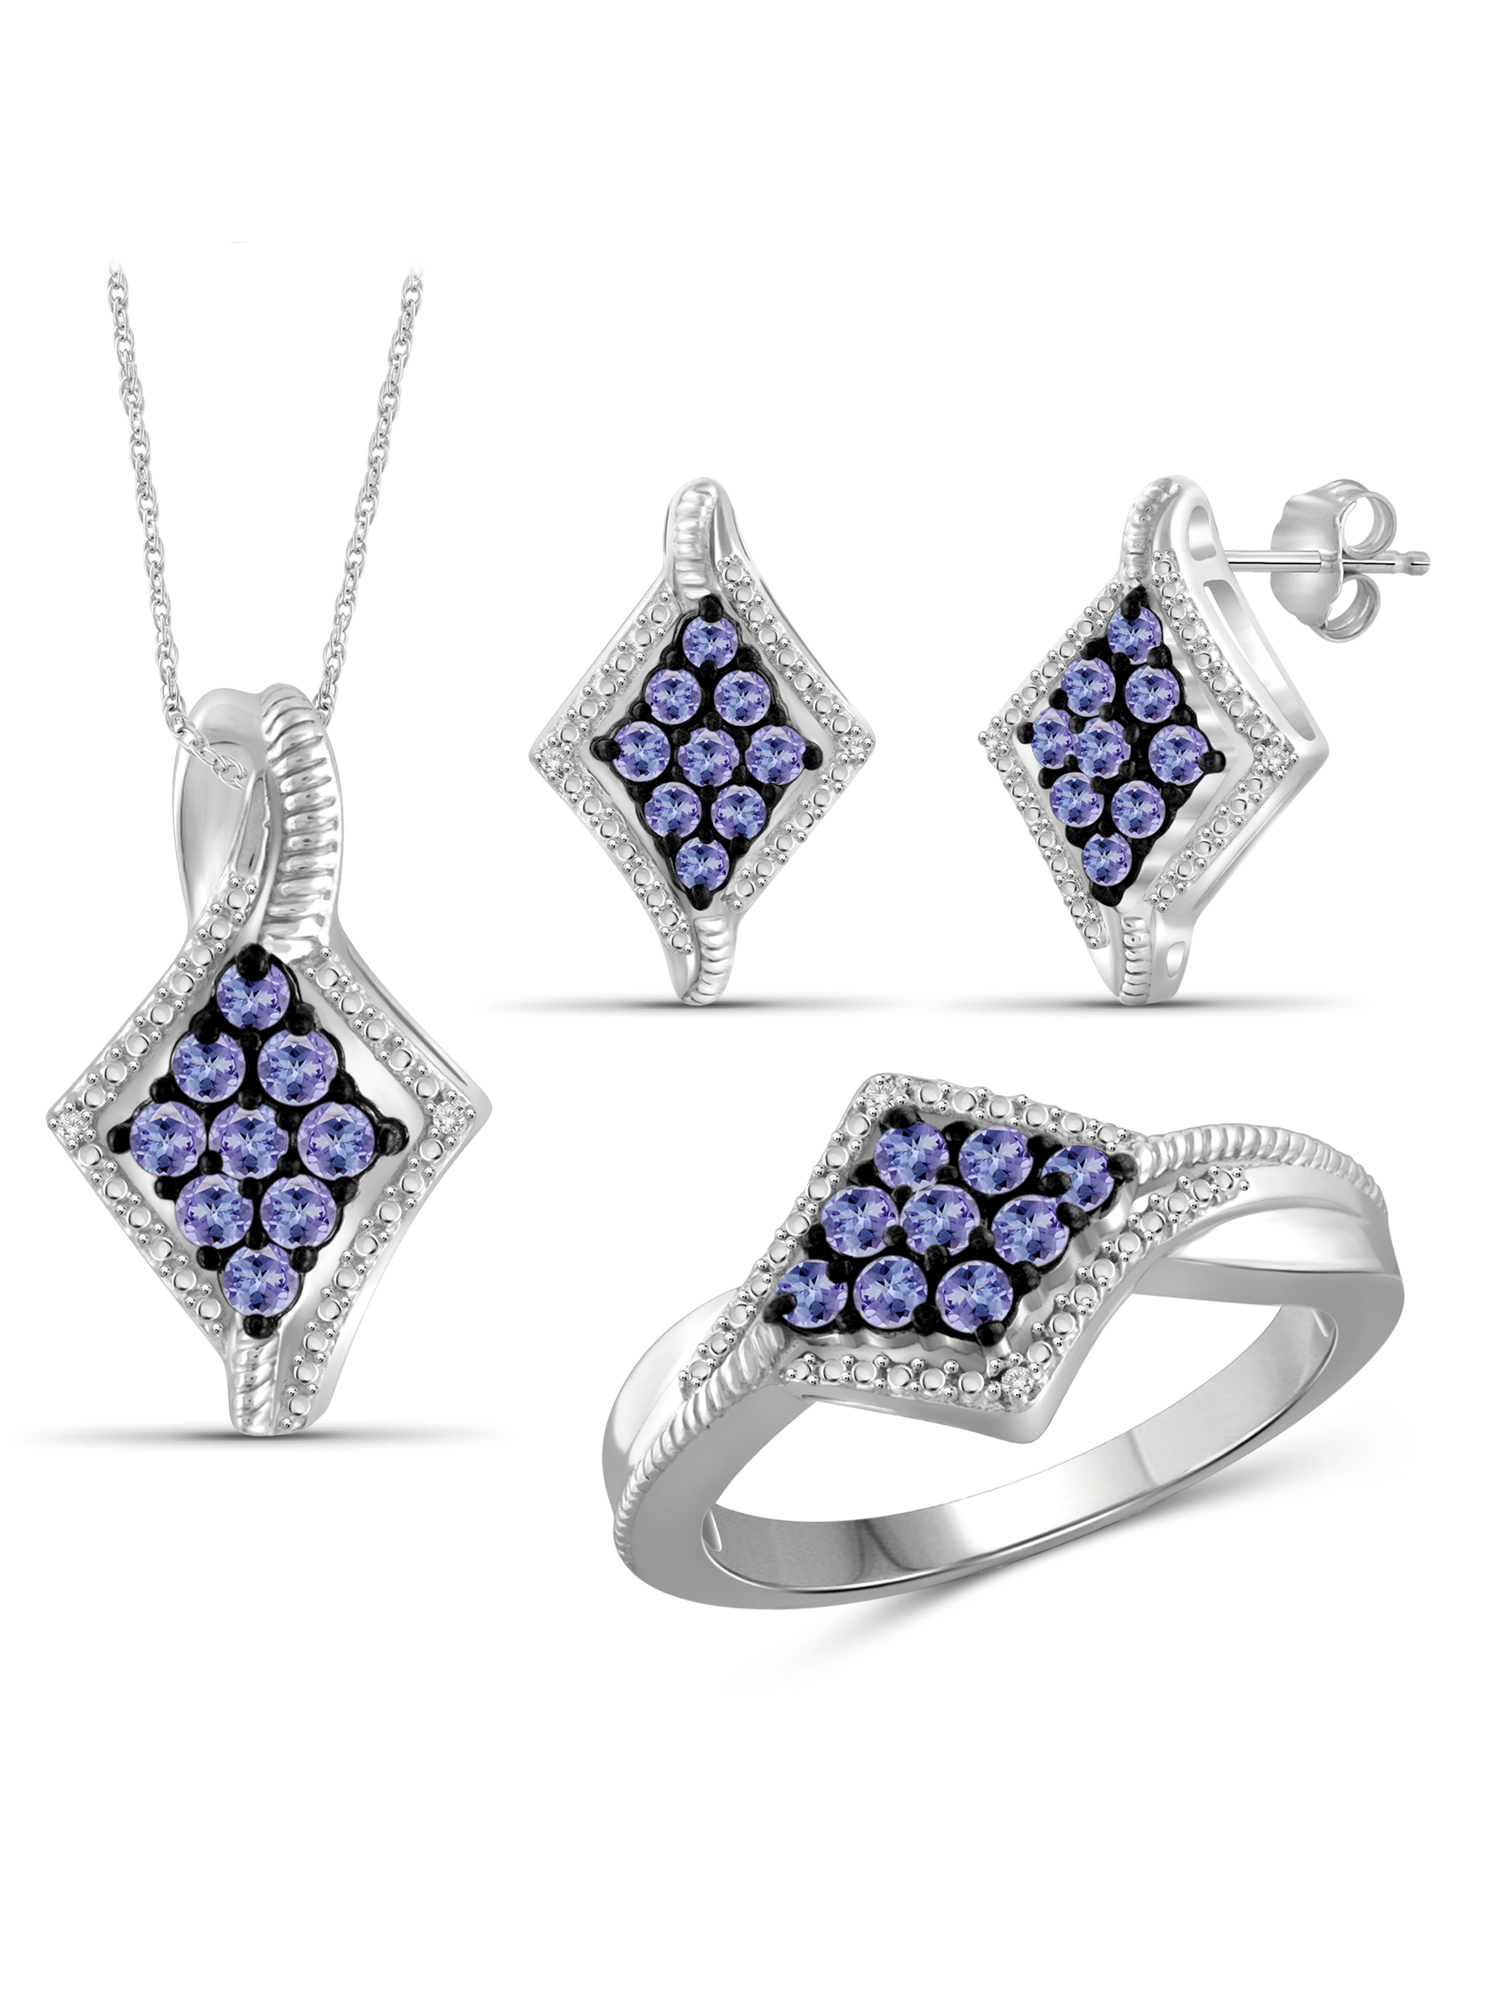 JewelersClub 1 1 2 Carat T.G.W. Tanzanite And White Diamond Accent Sterling Silver 3-Piece Kite Jewelry set by JewelersClub